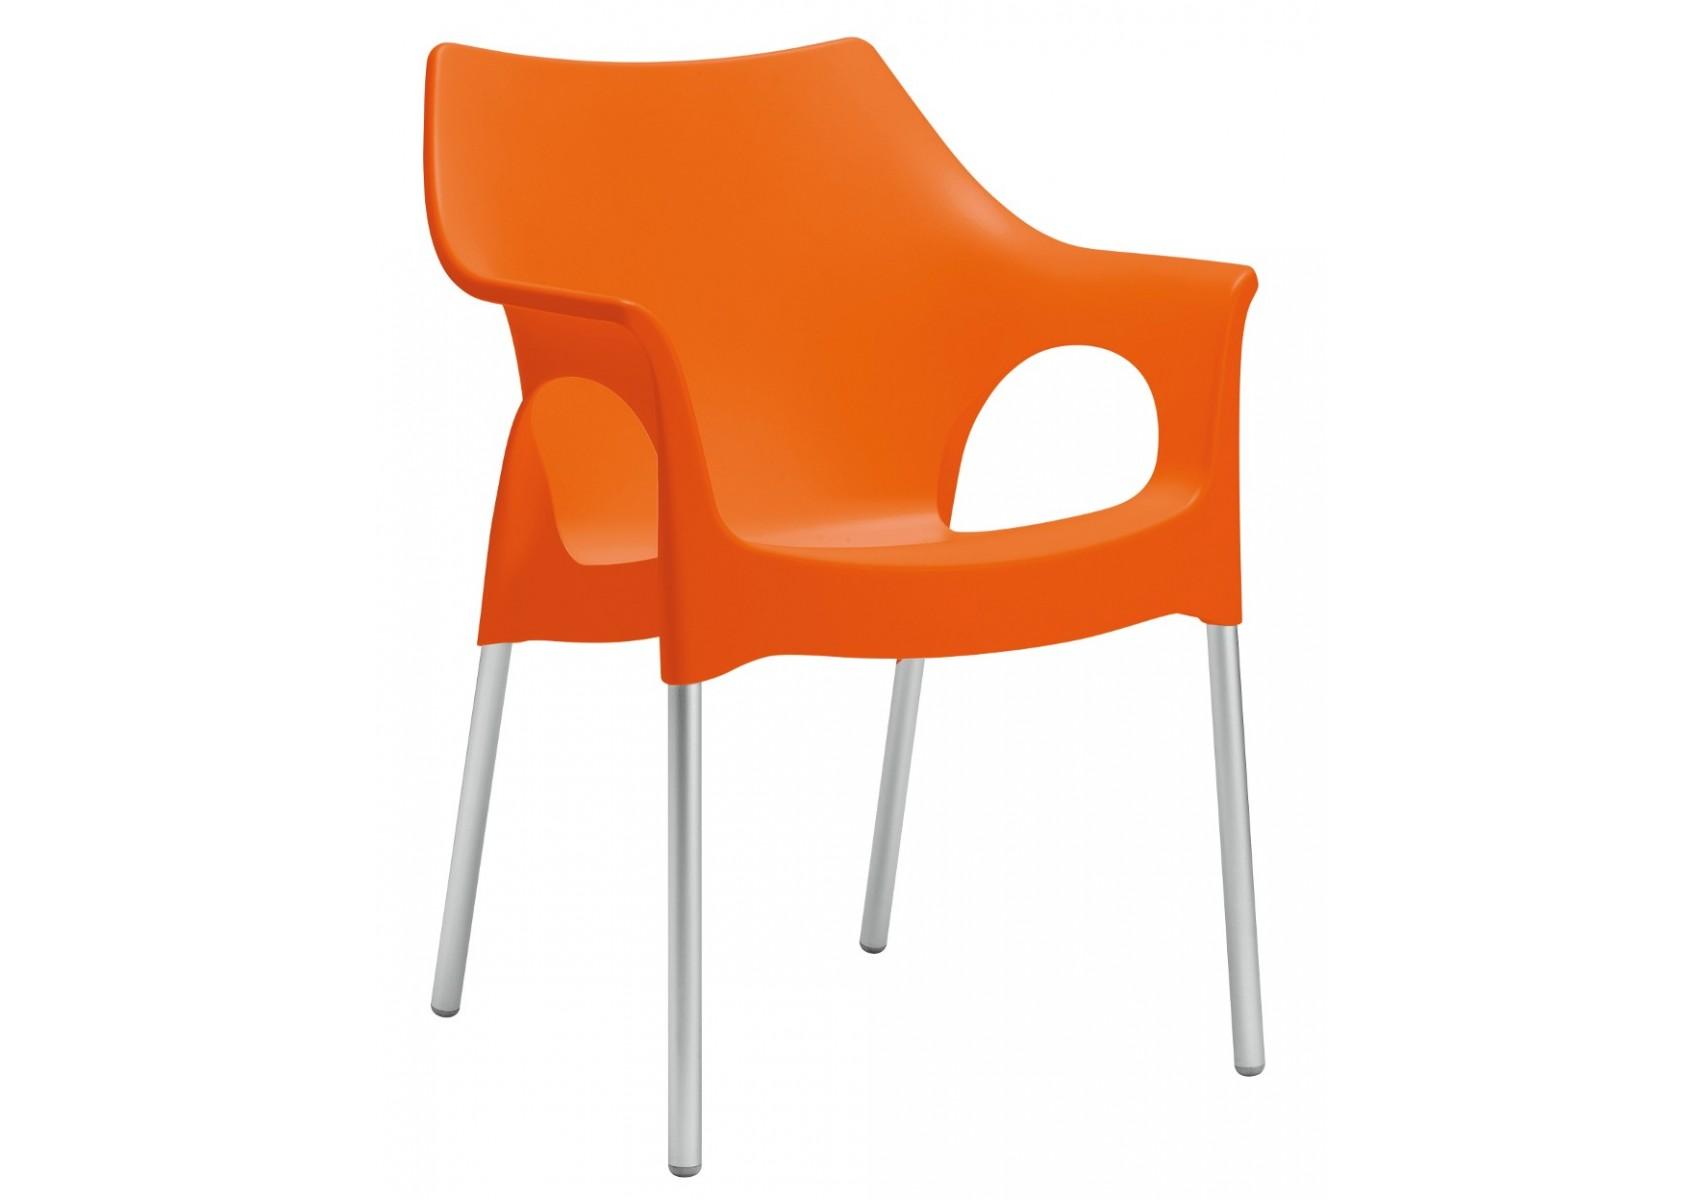 4 chaises design de jardin ola lot de 4 deco boite design - Lot de 4 chaises design ...